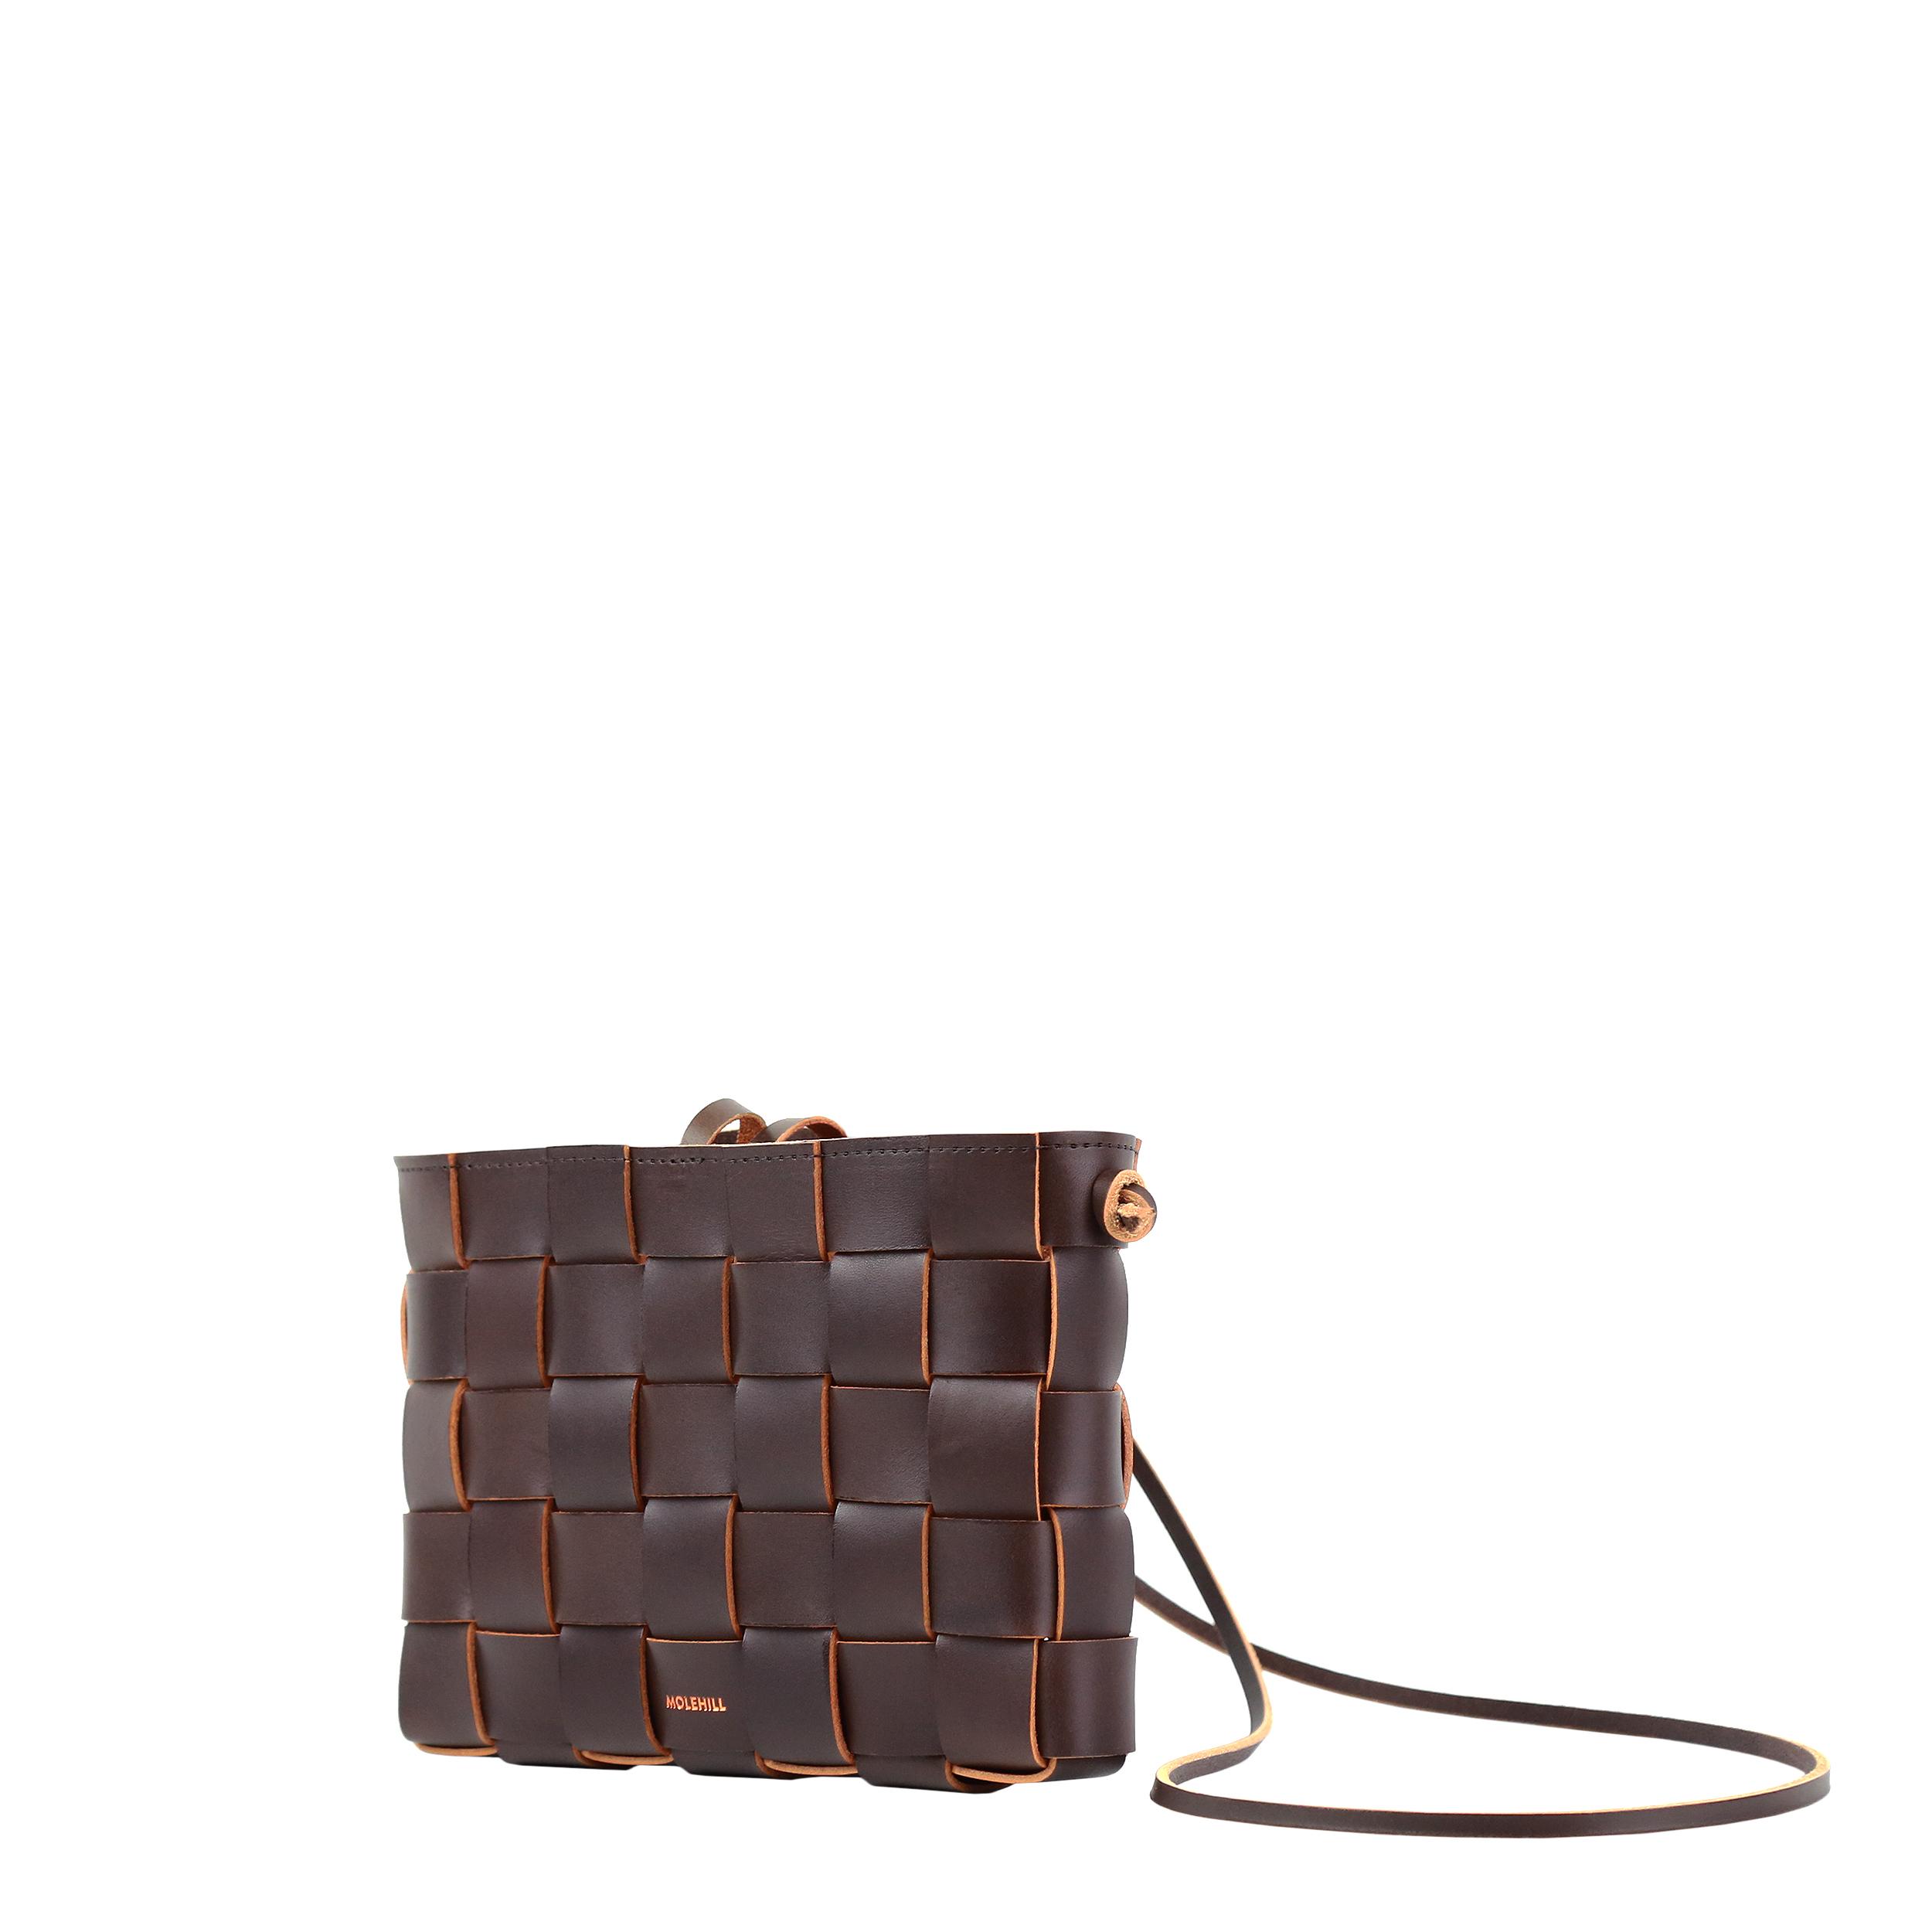 Pane Crossbodgt Woven Bag Dark Chocolate 2-4